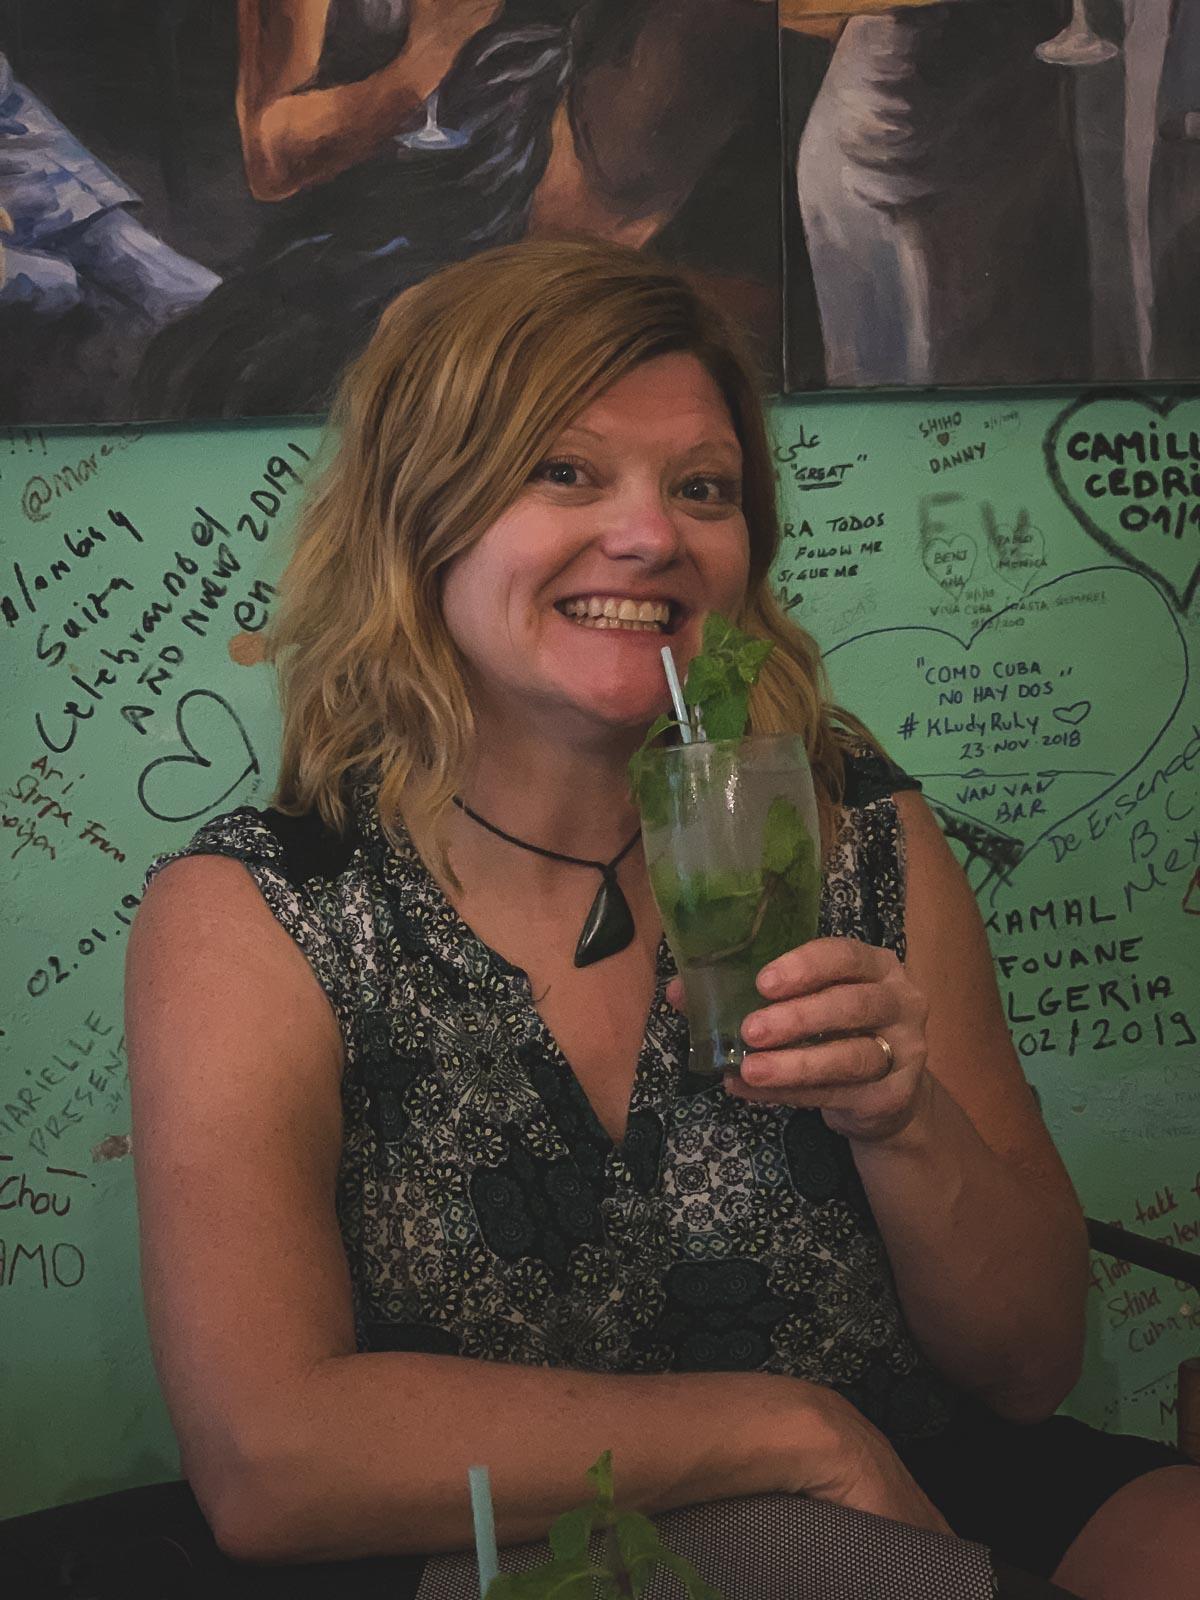 cuban facts - mojito cocktail